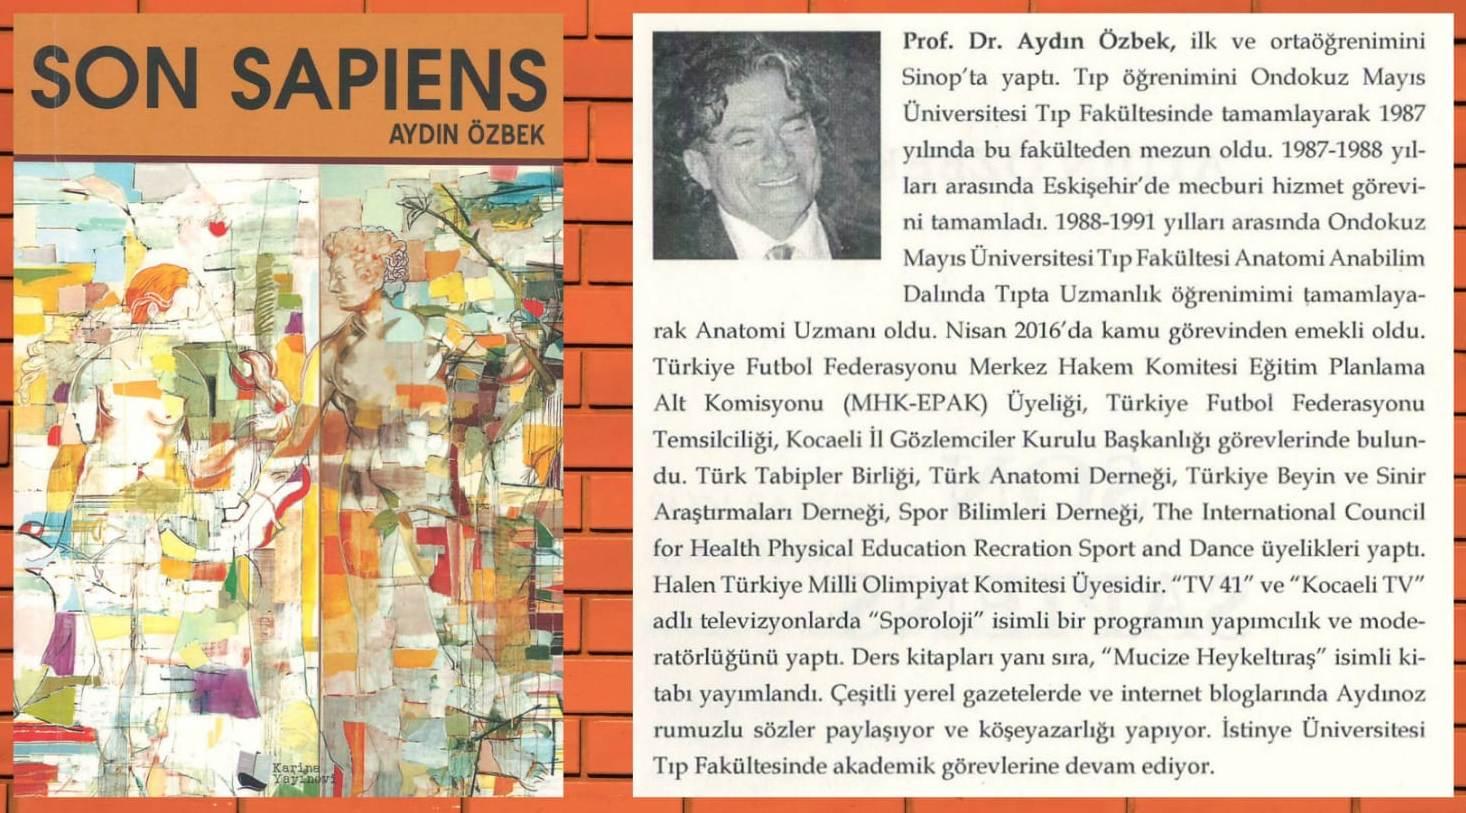 Prof.Dr. Aydın Özbek:SON SAPİENS